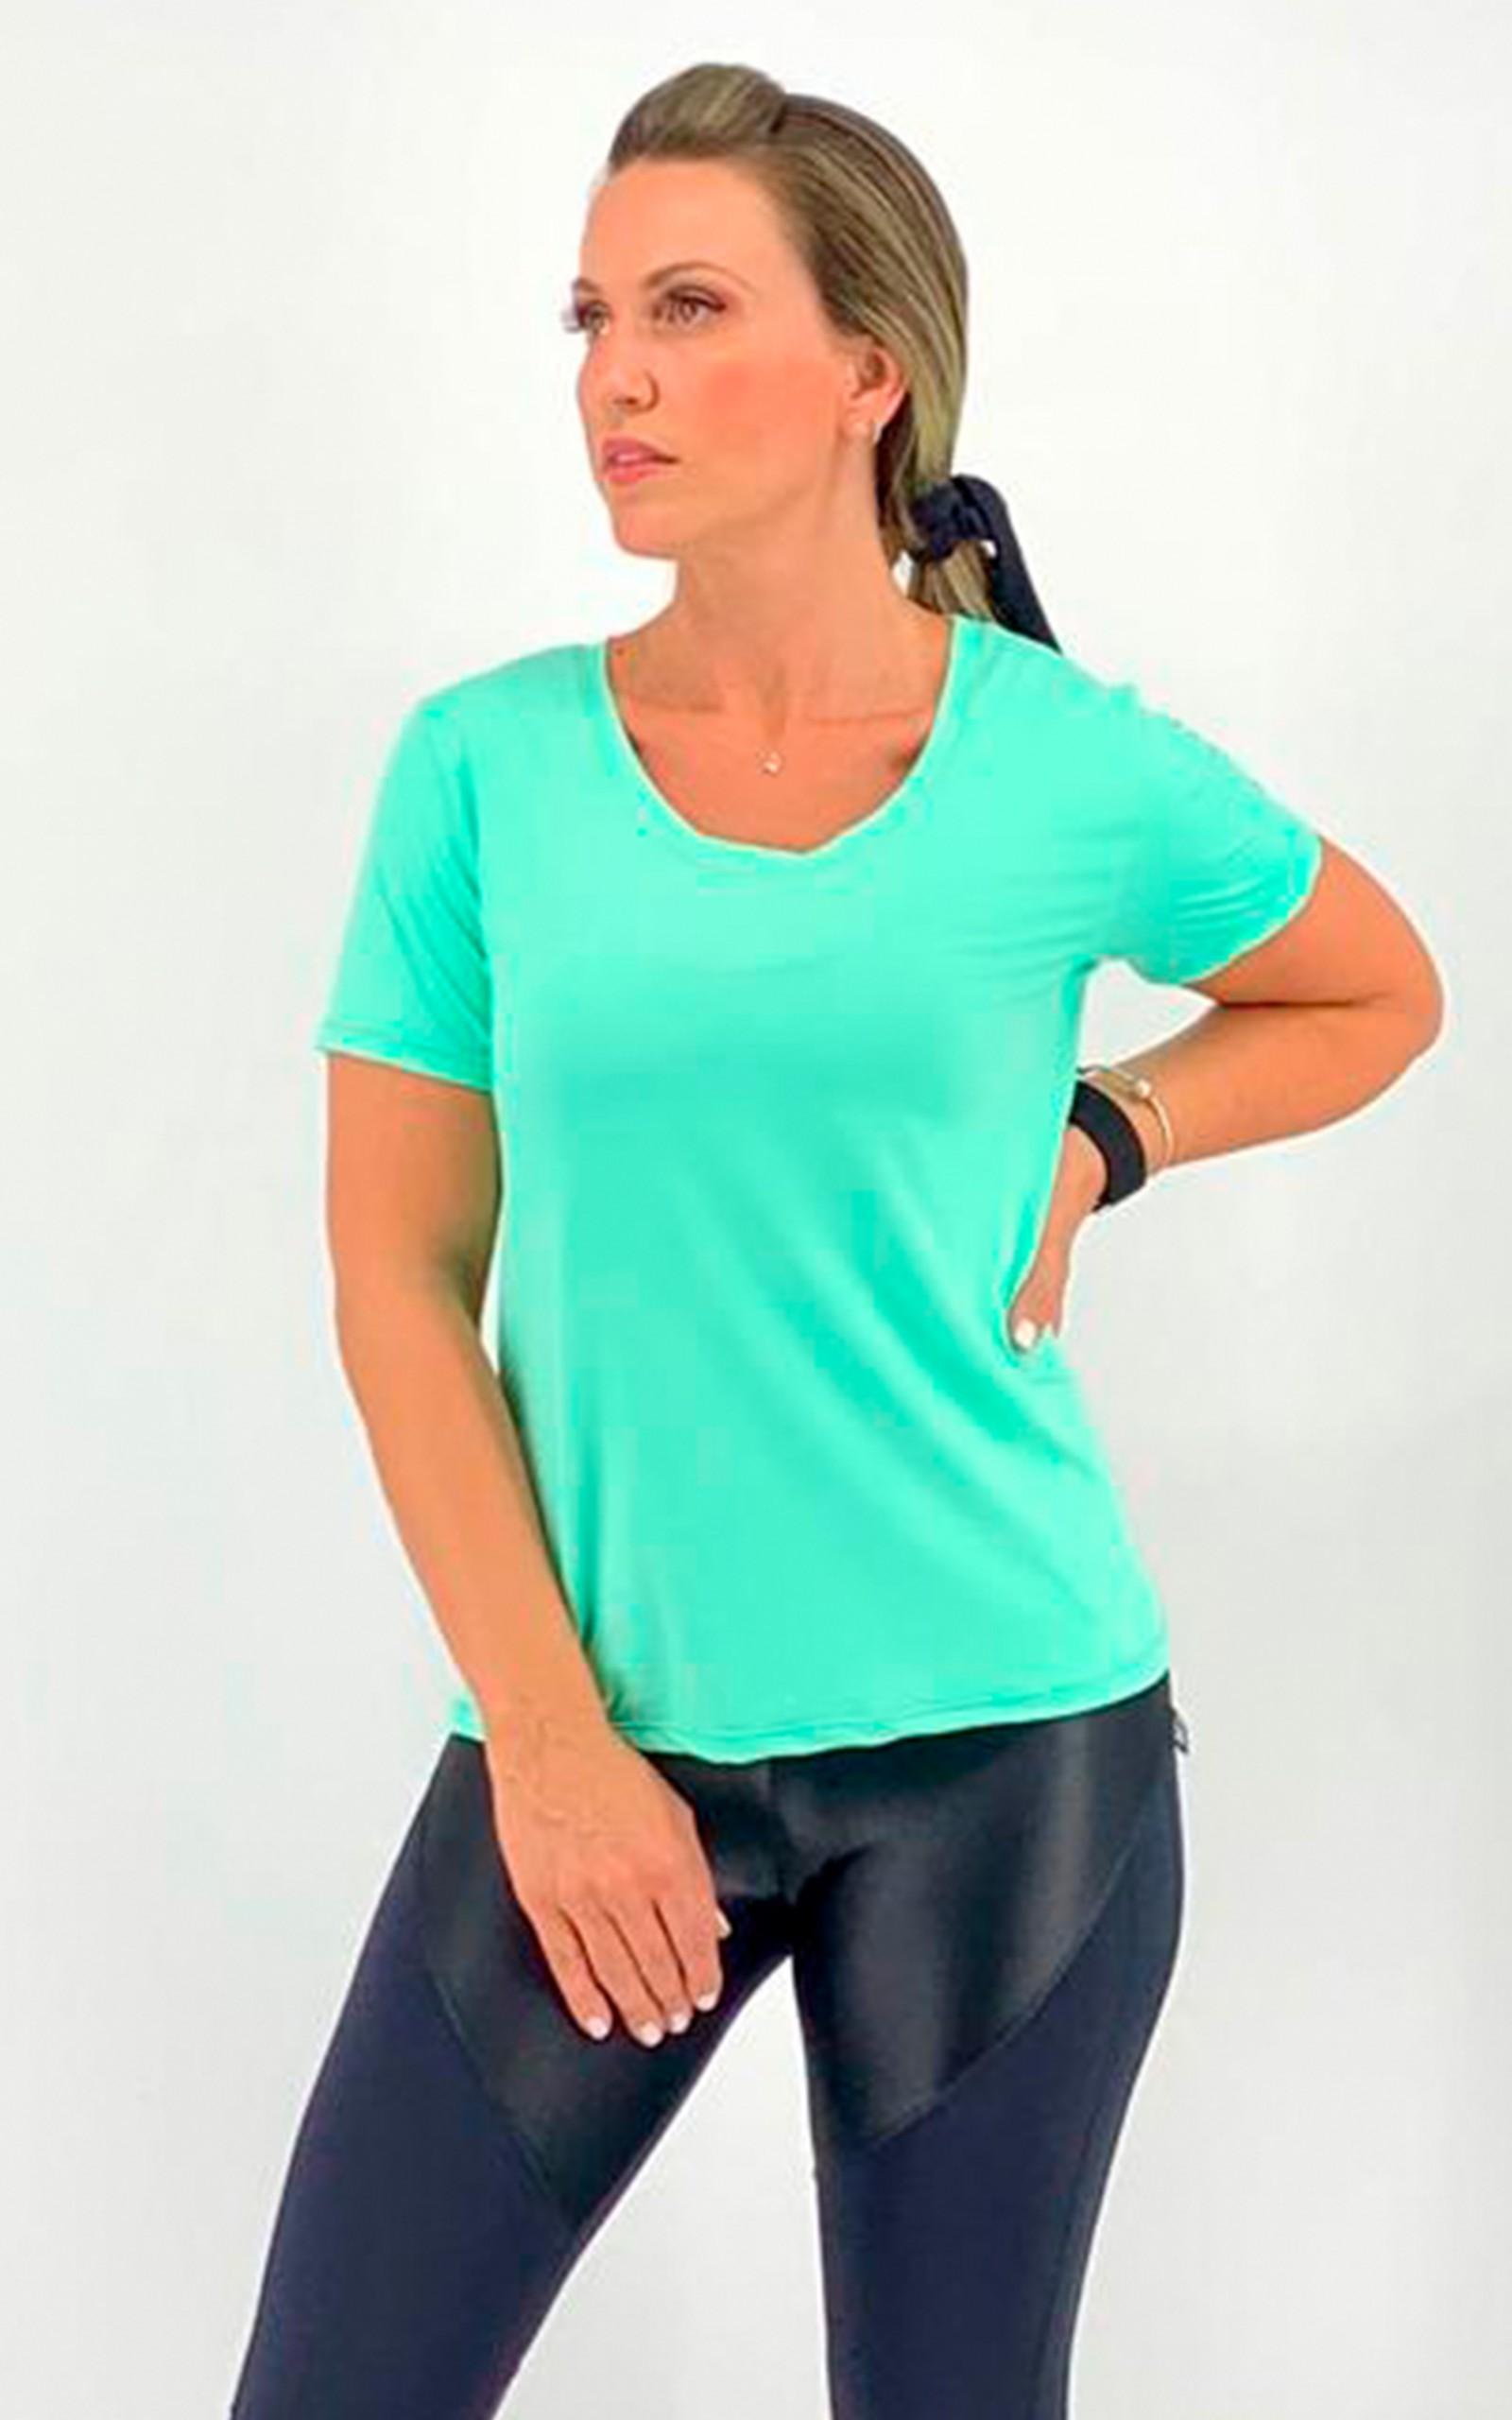 Baby Look Spice Dry Menta, Coleção Move Your Body - NKT Fitwear Moda Fitness